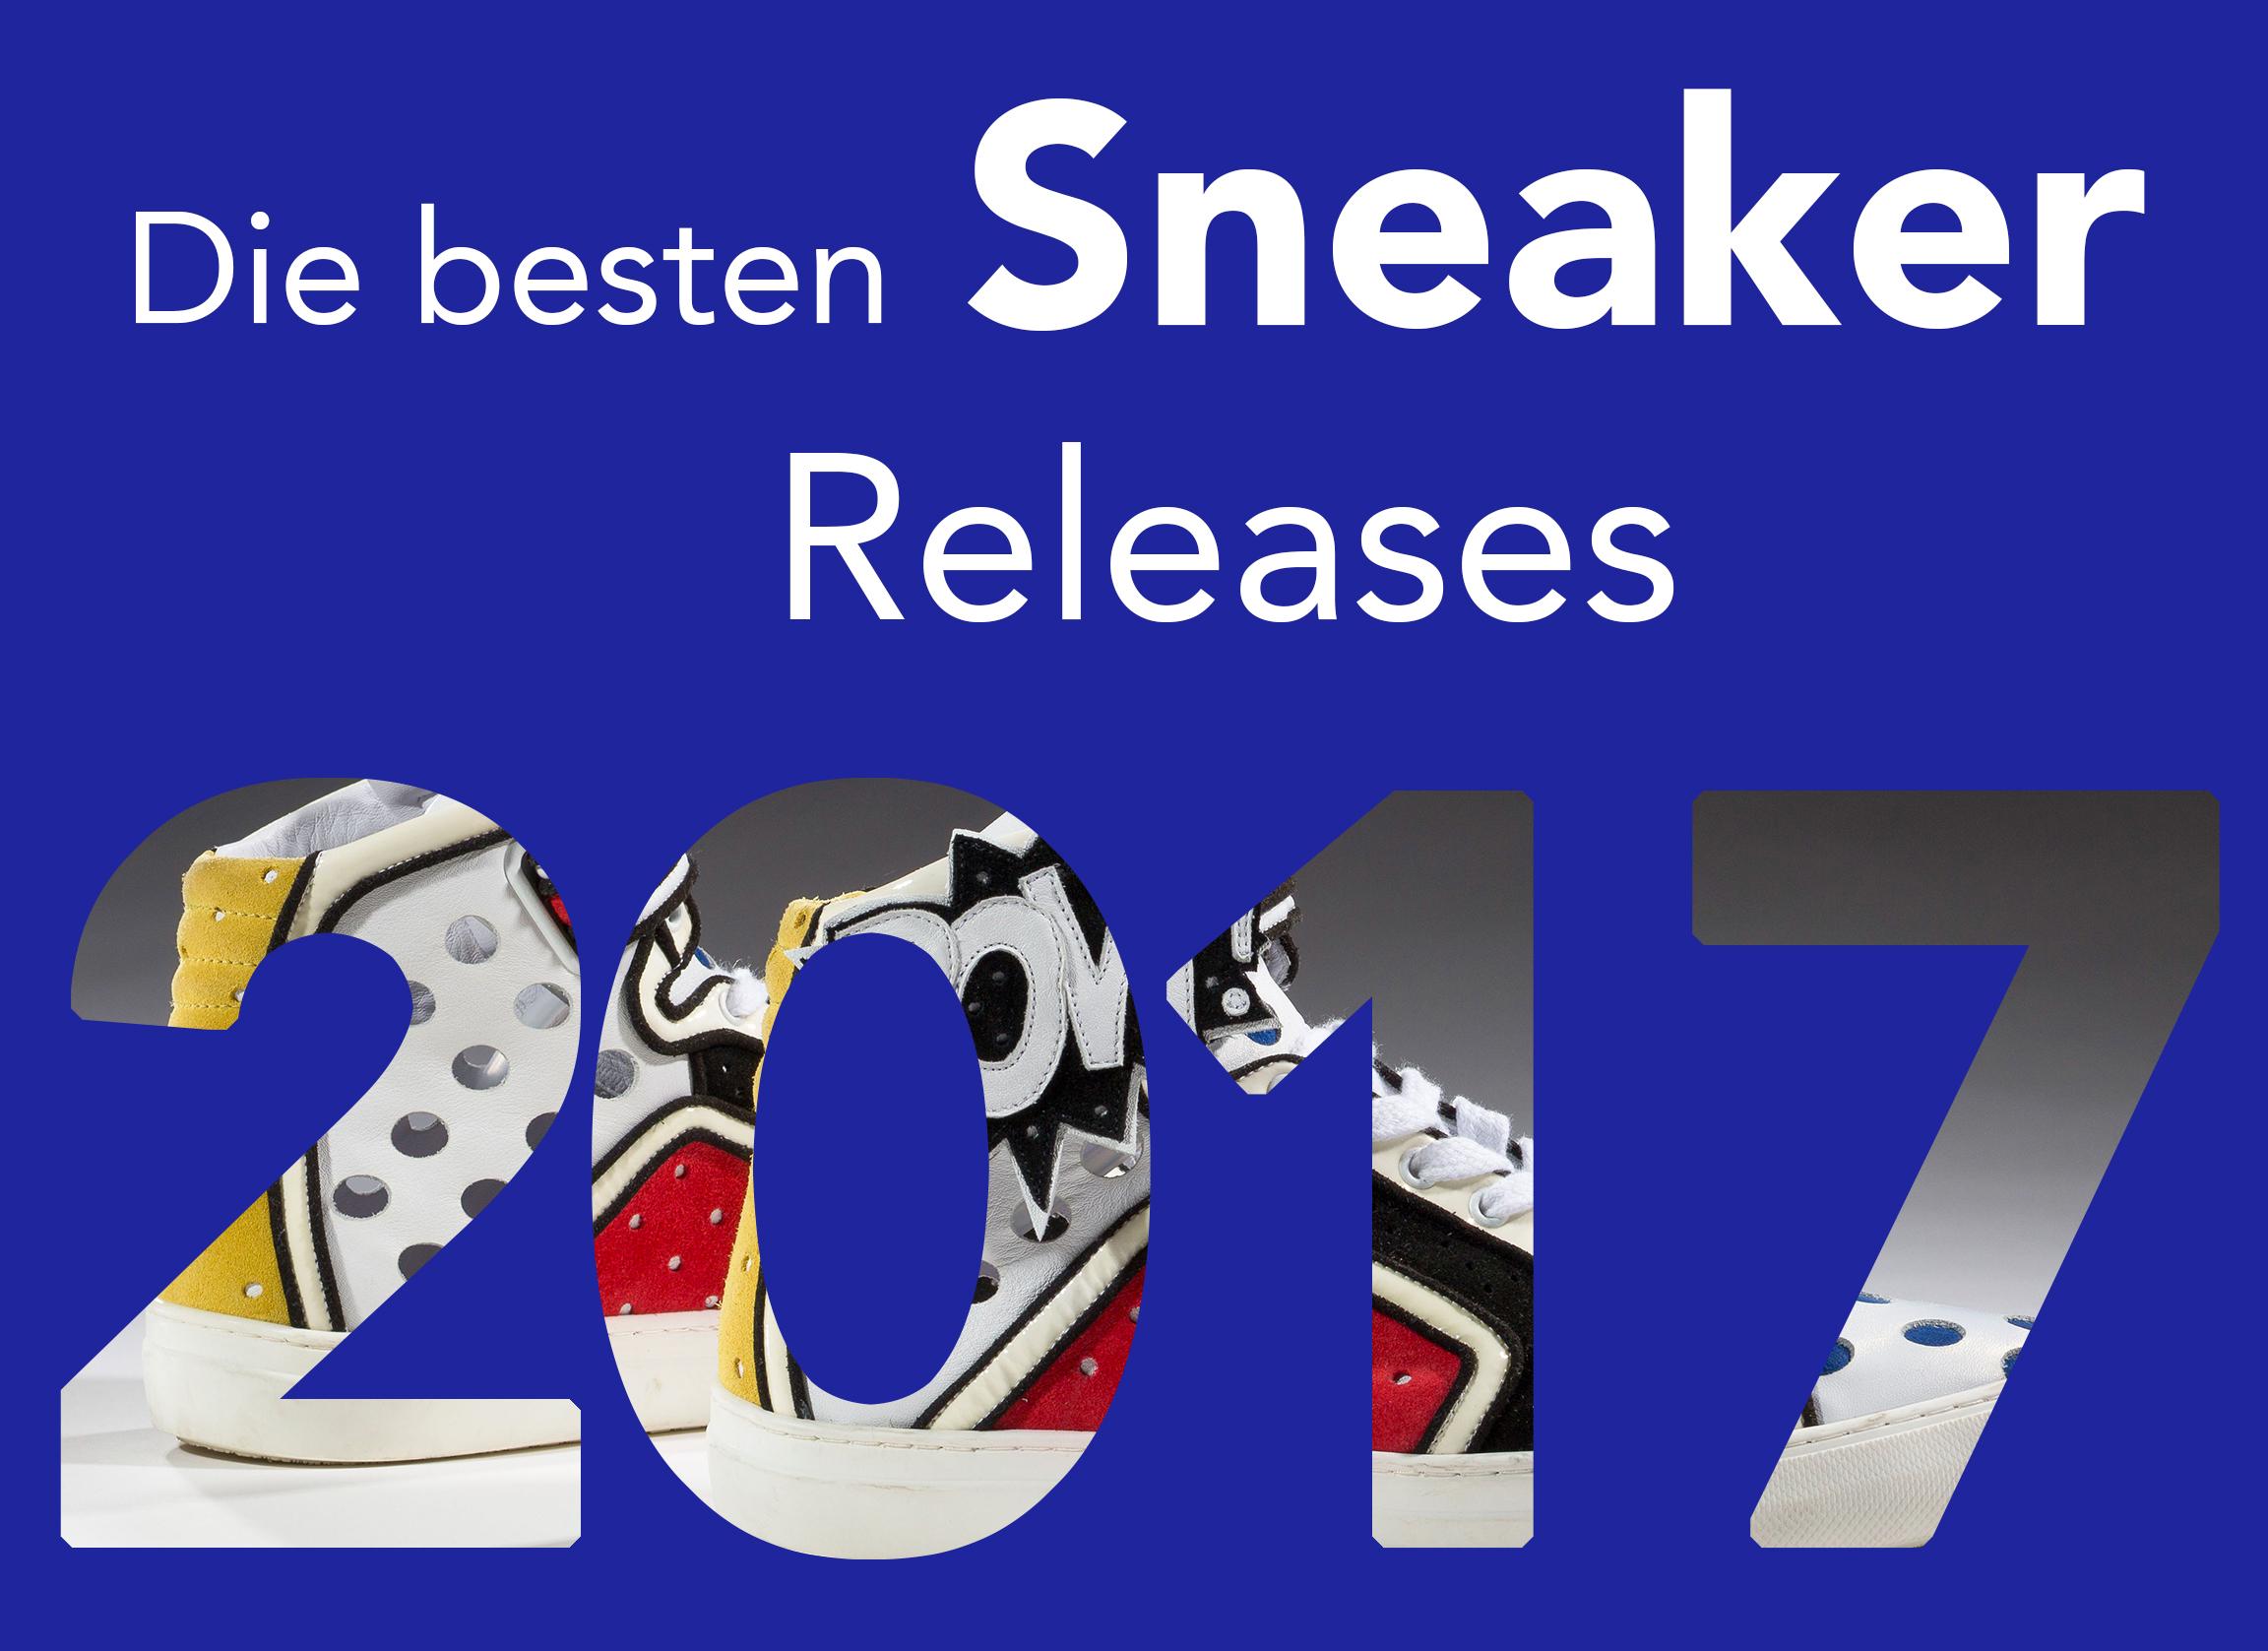 Die besten Sneaker Releases 2017